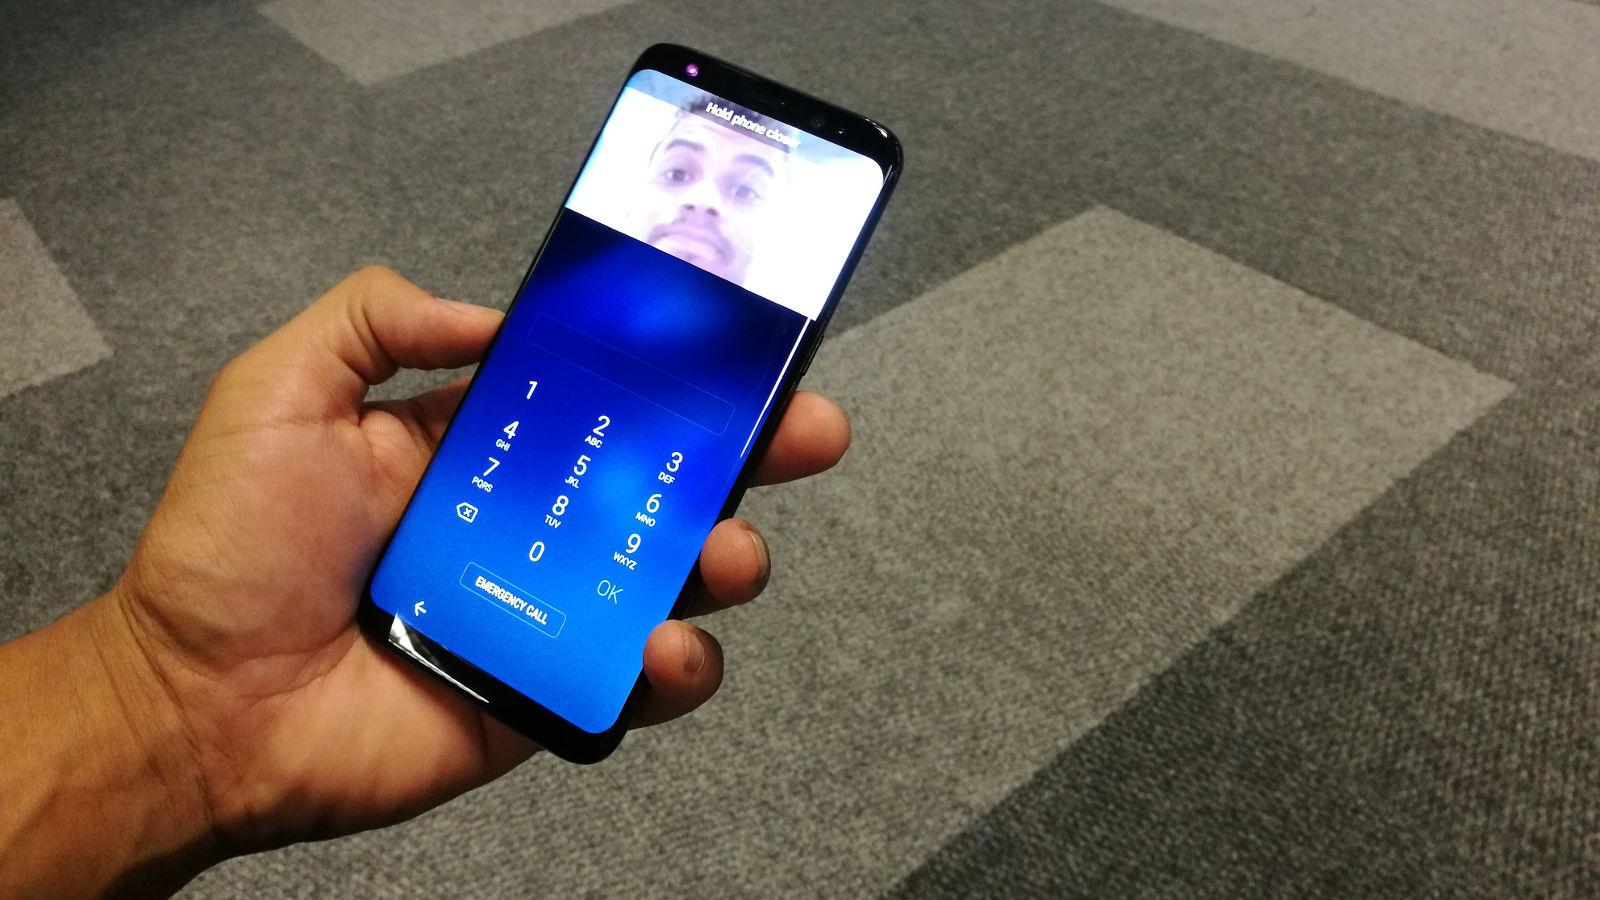 Samsung Galaxy S8 iris scanners